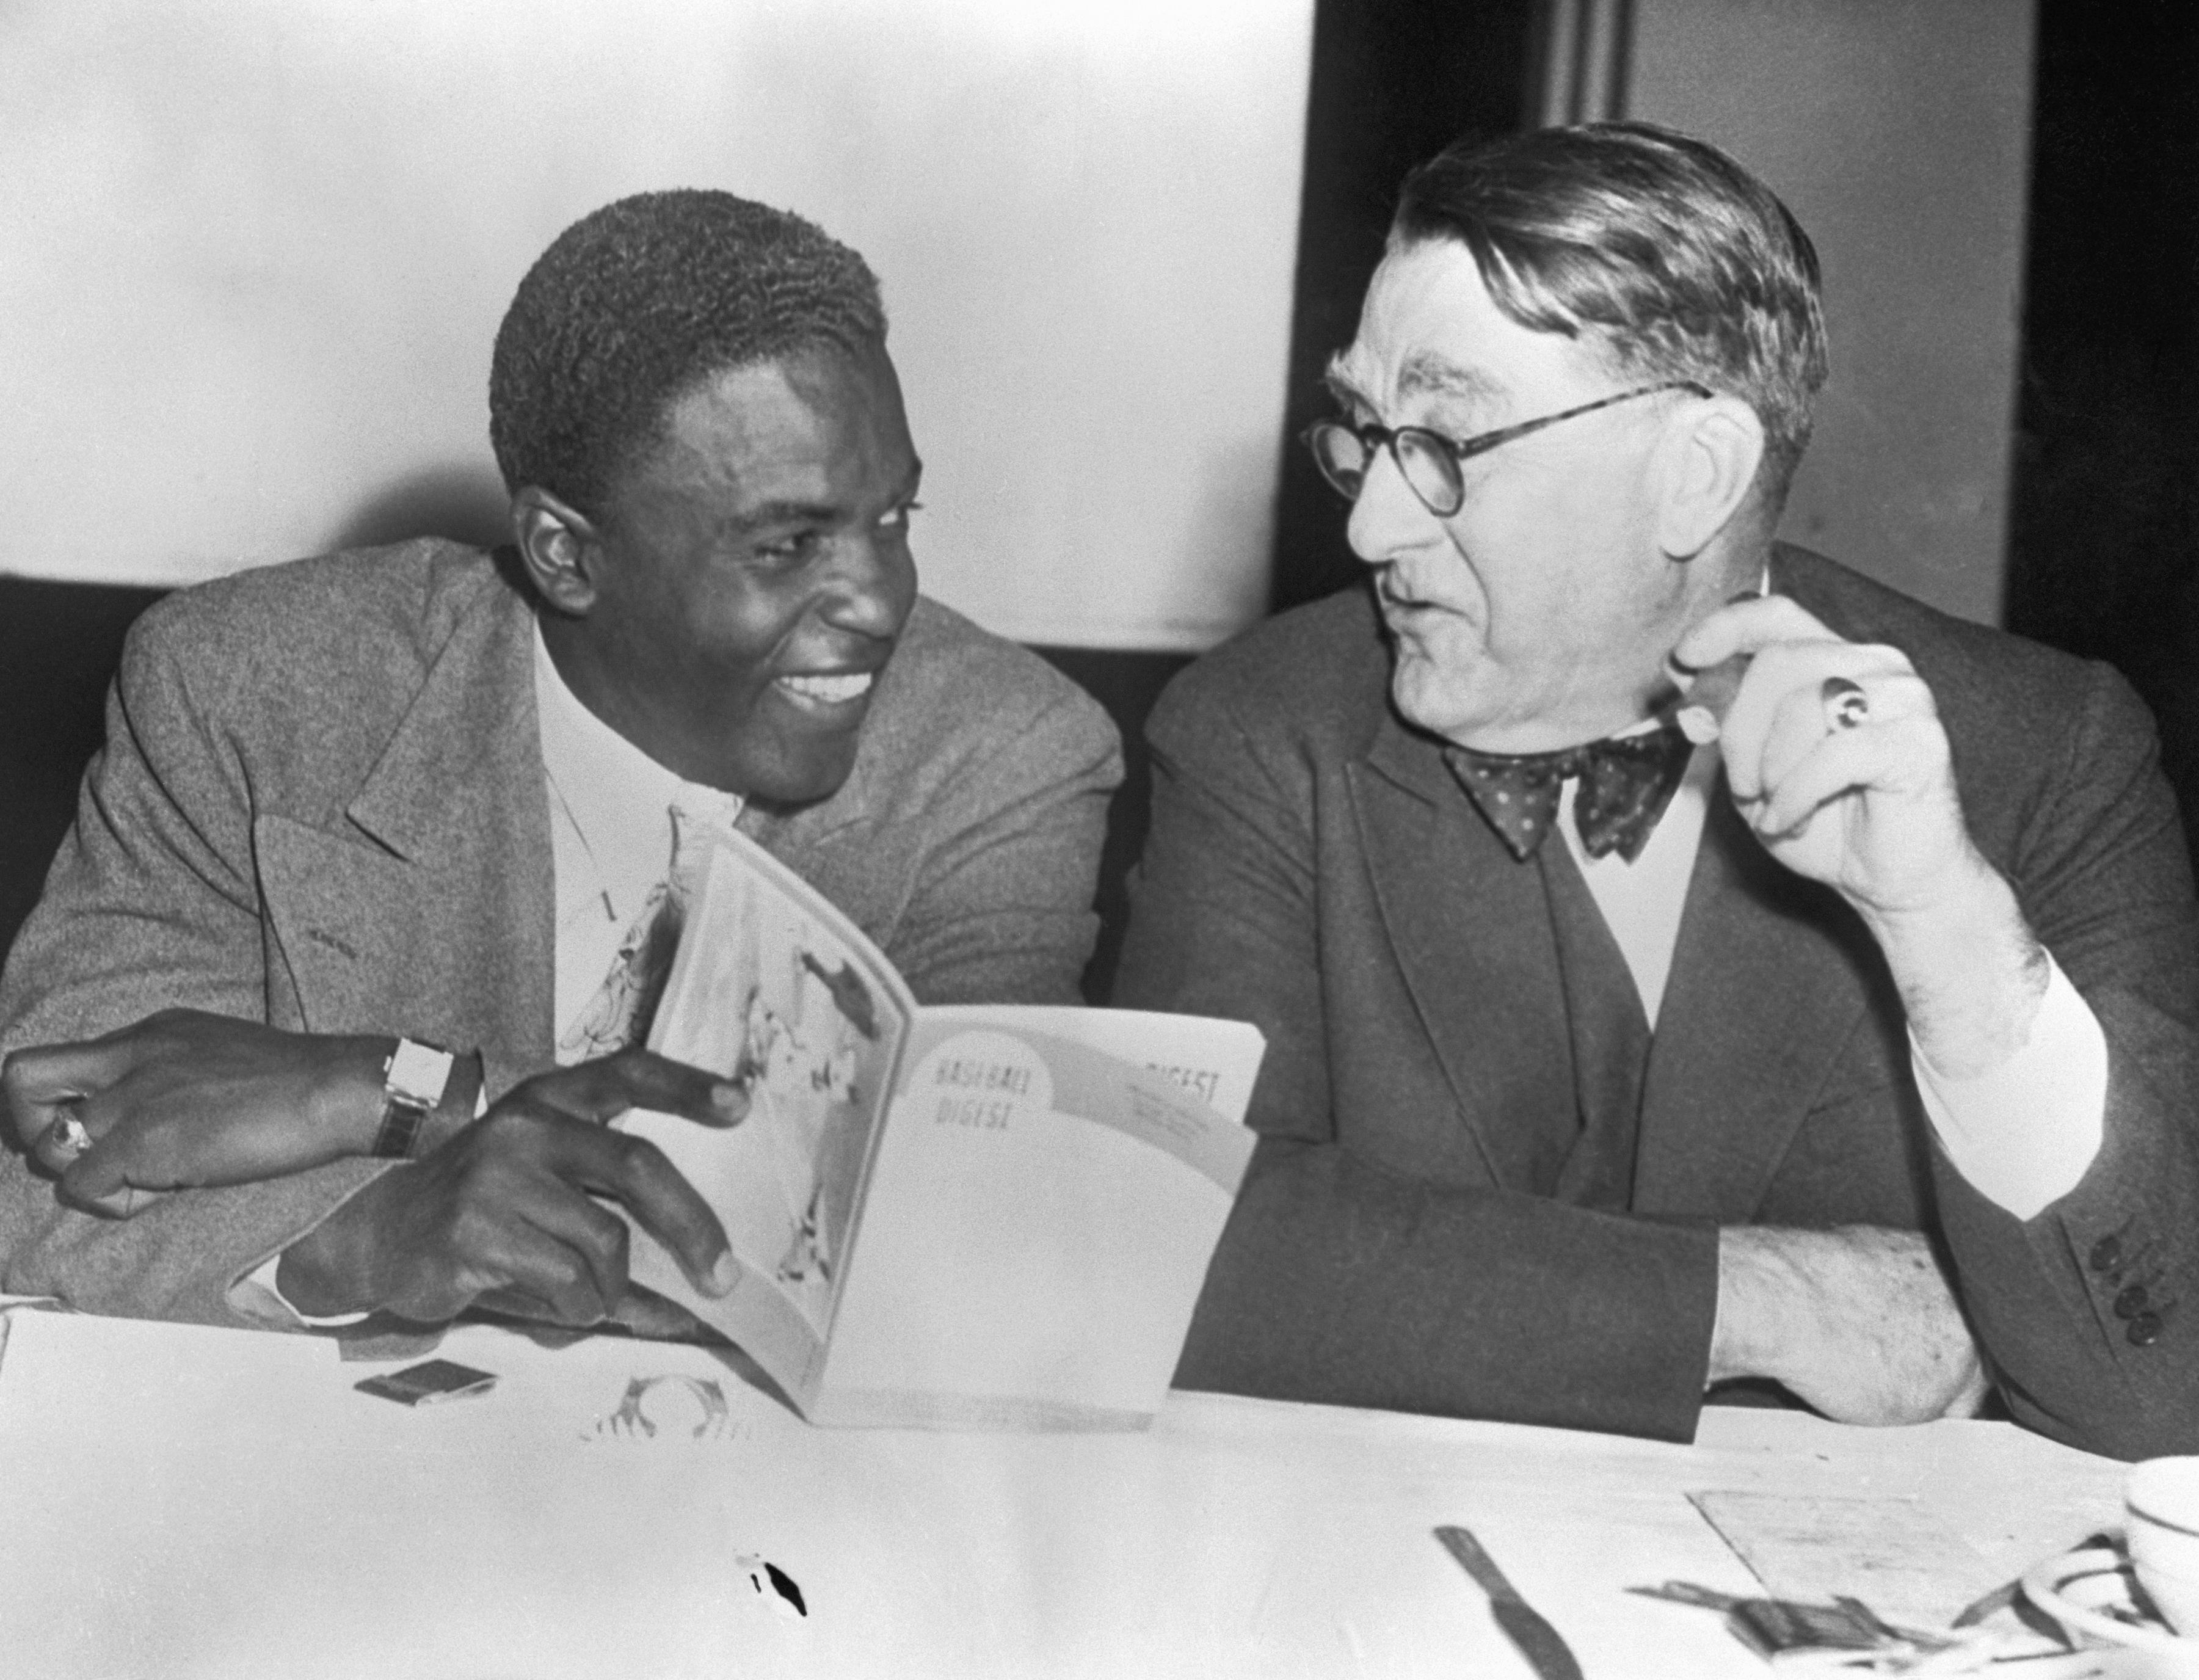 Jackie Robinson and Branch Rickey Looking at Book